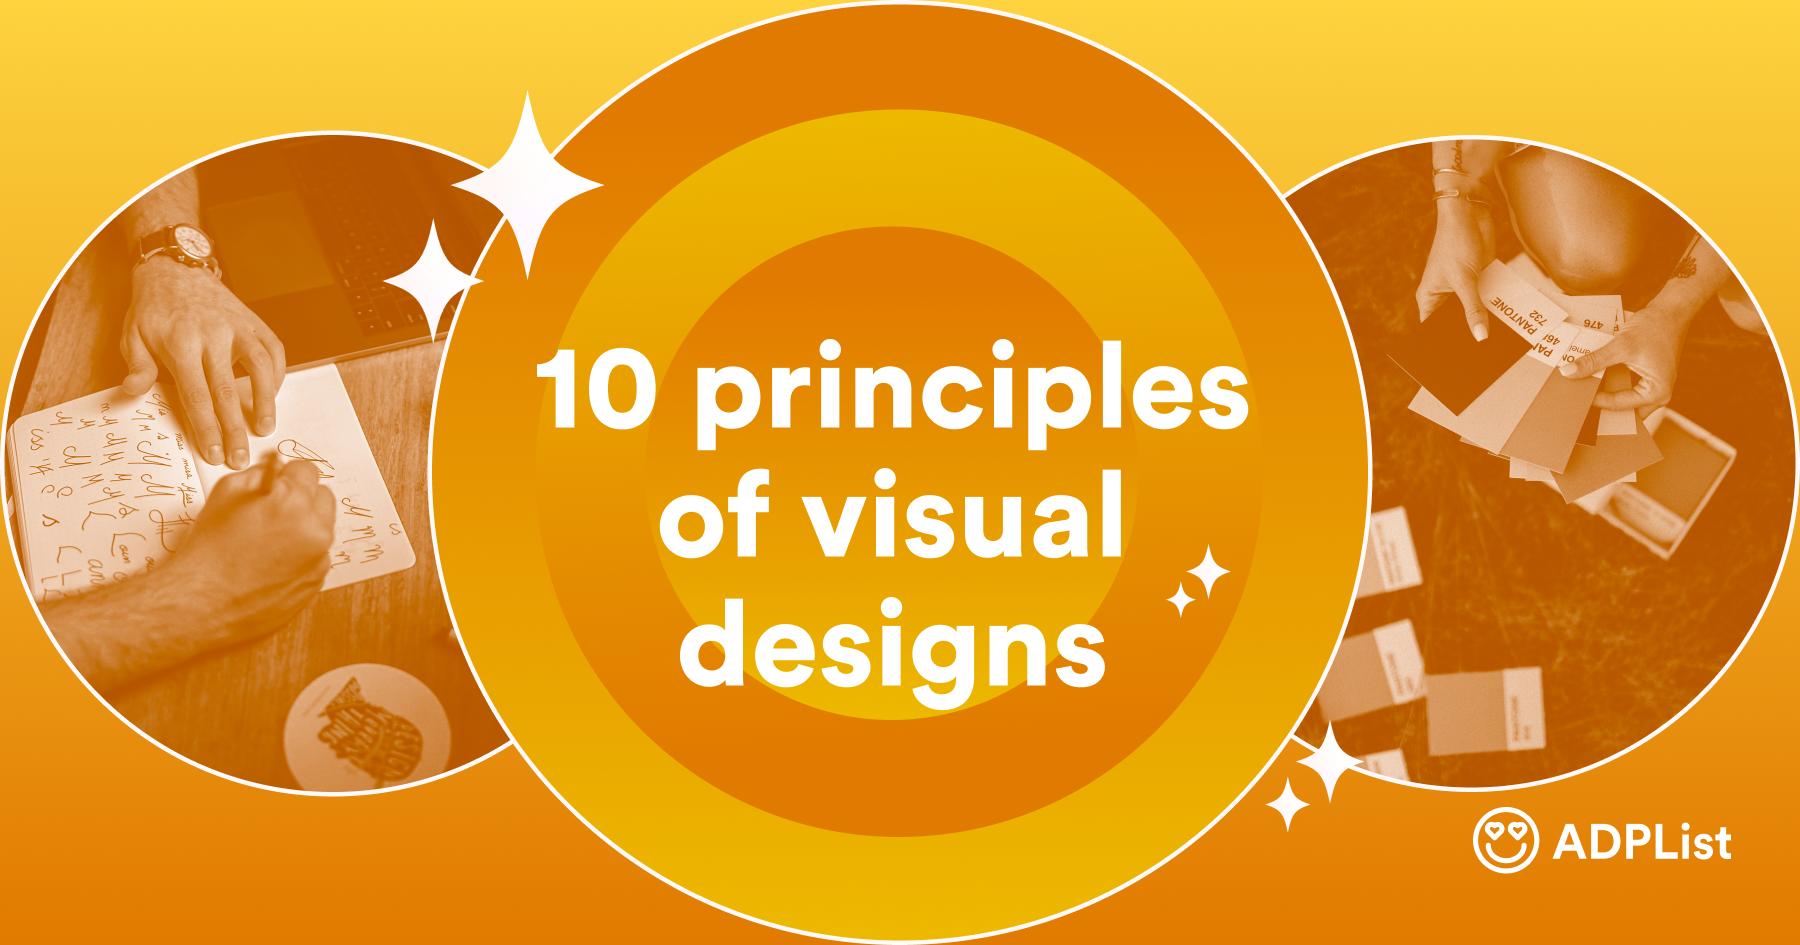 10 principles of visual designs